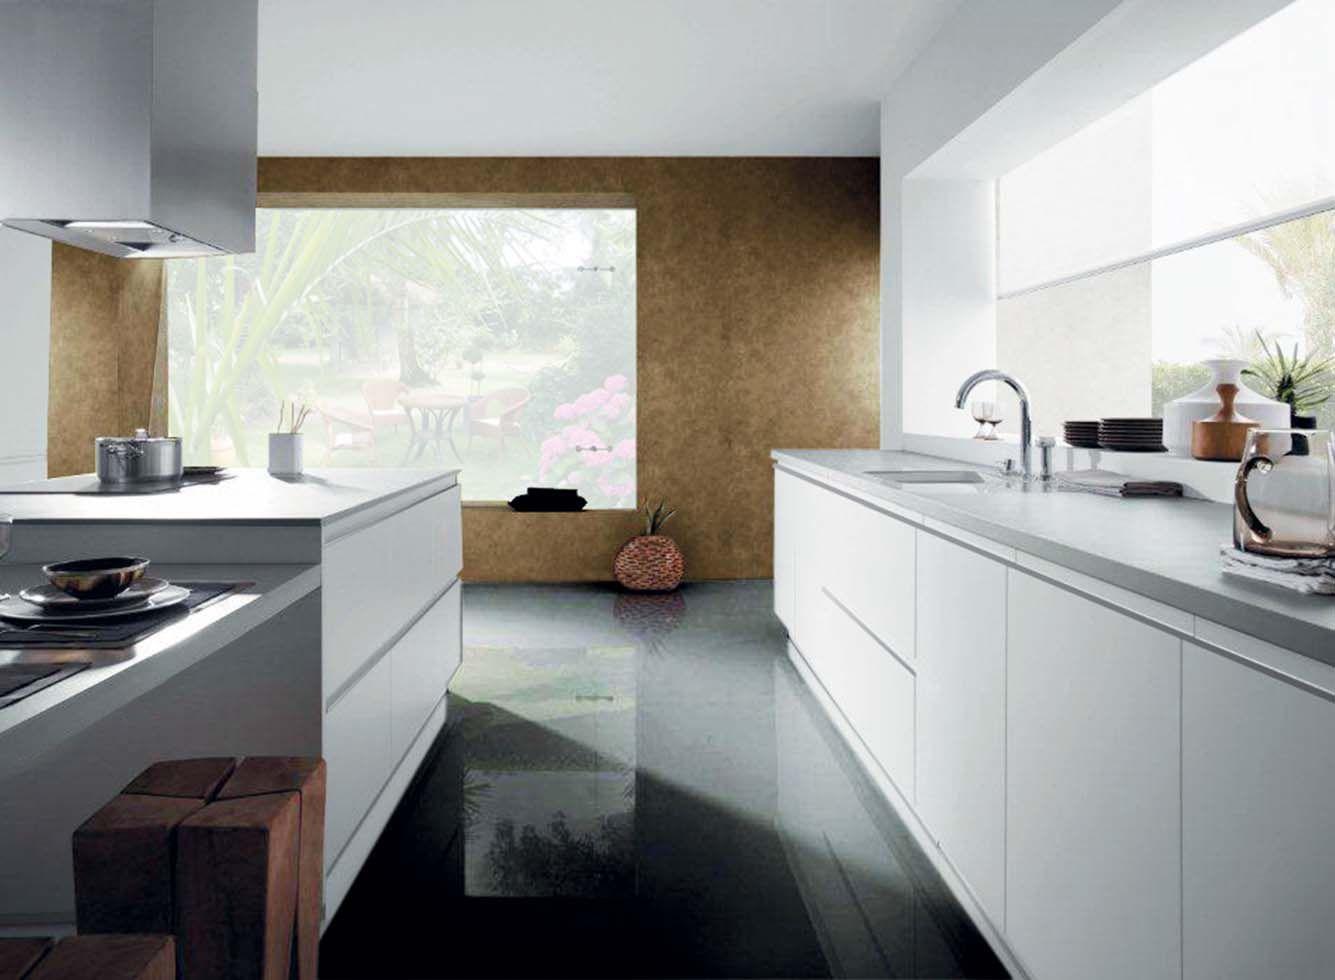 Cocina 79 cocinas capis dise o y fabricaci n de cocinas for Configurador de cocinas